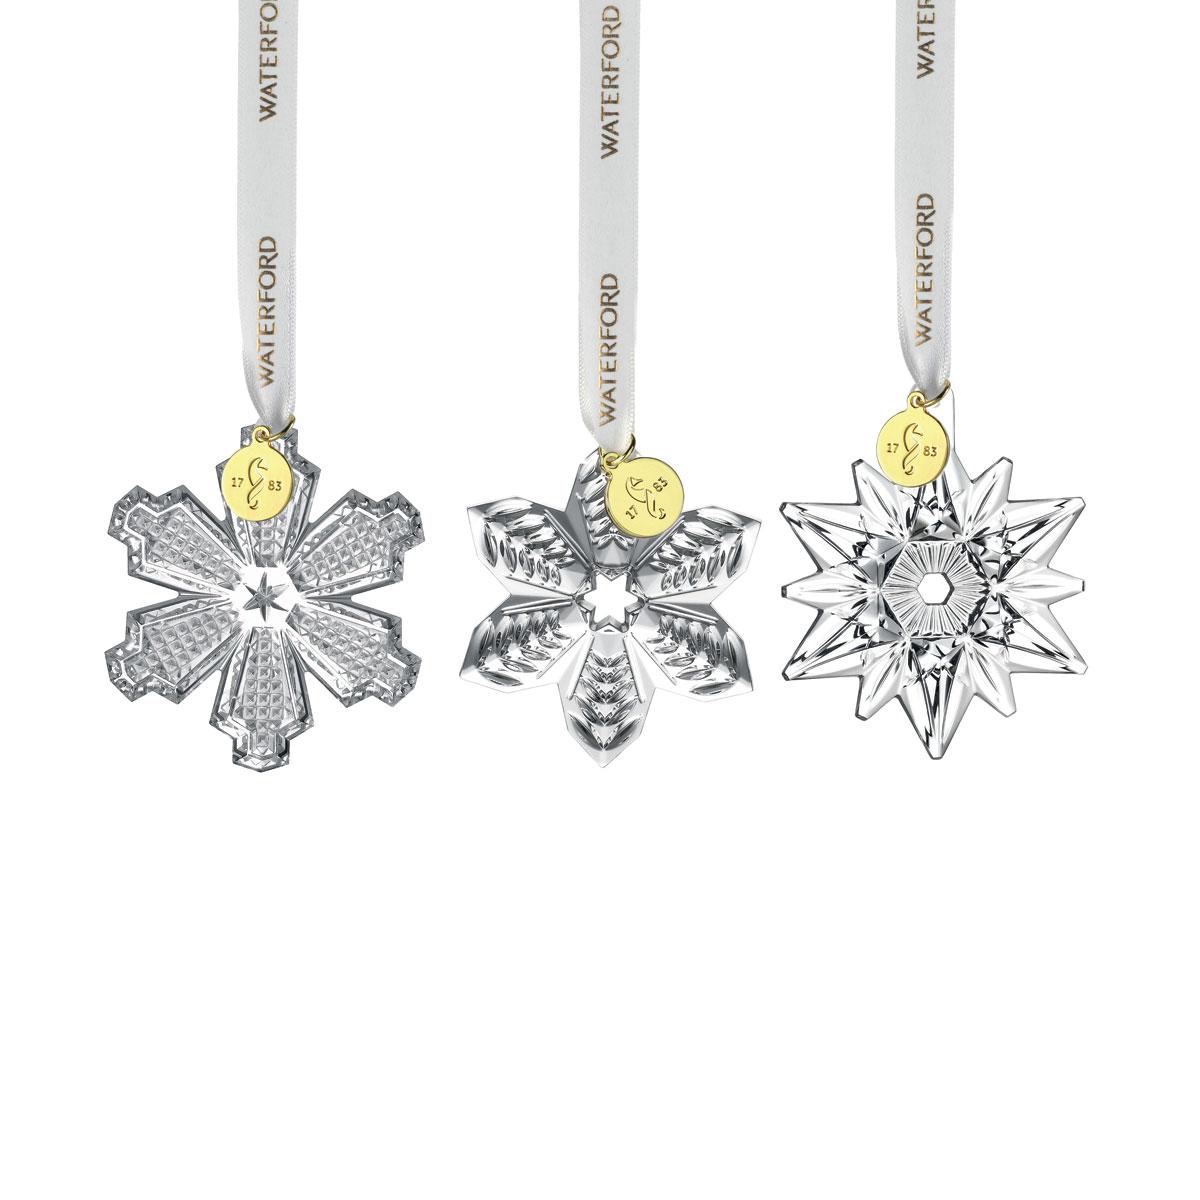 Waterford Crystal 2021 Mini Ornaments Set of Three